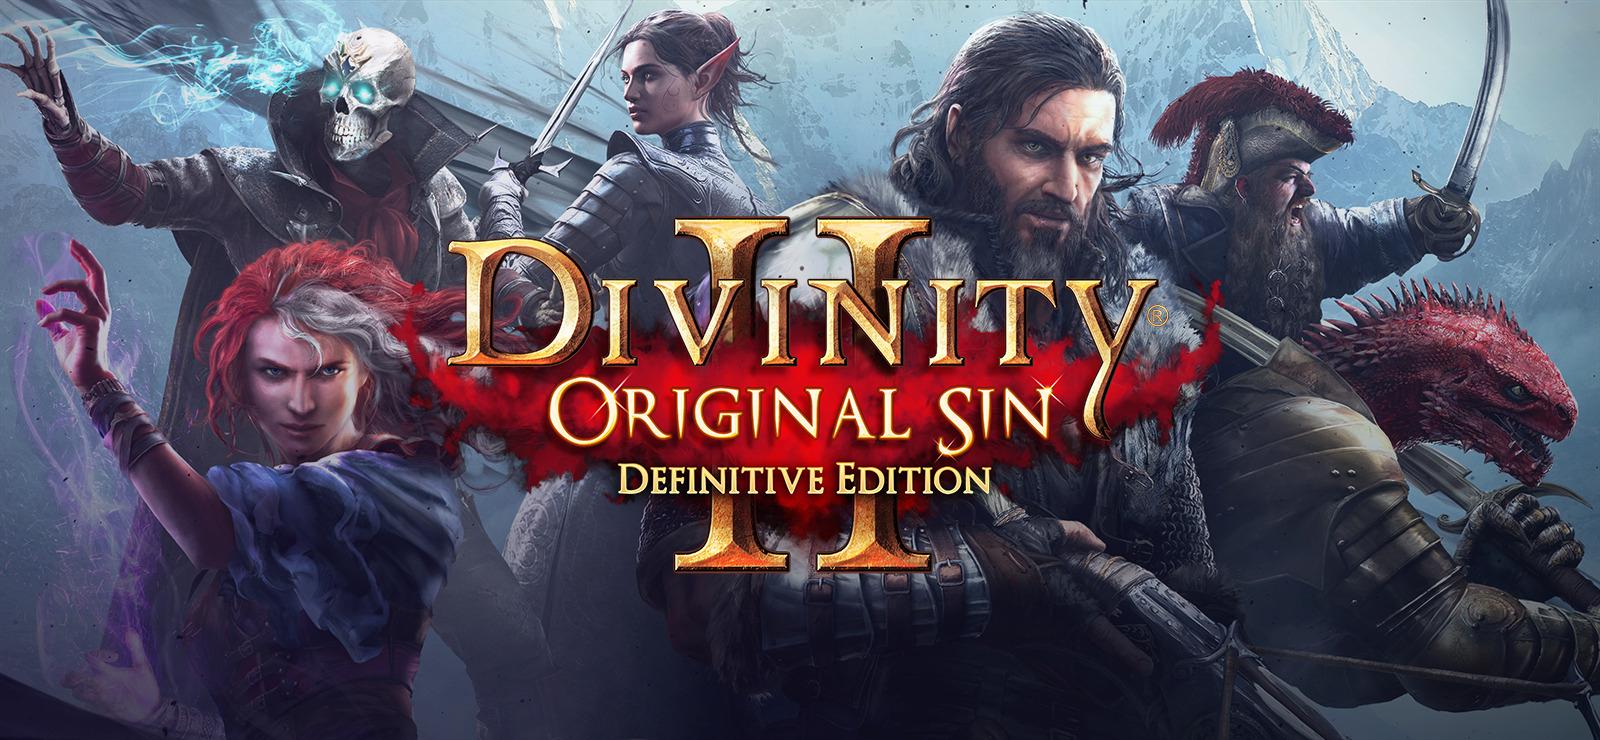 Divinity: Original Sin 2 - Definitive Edition